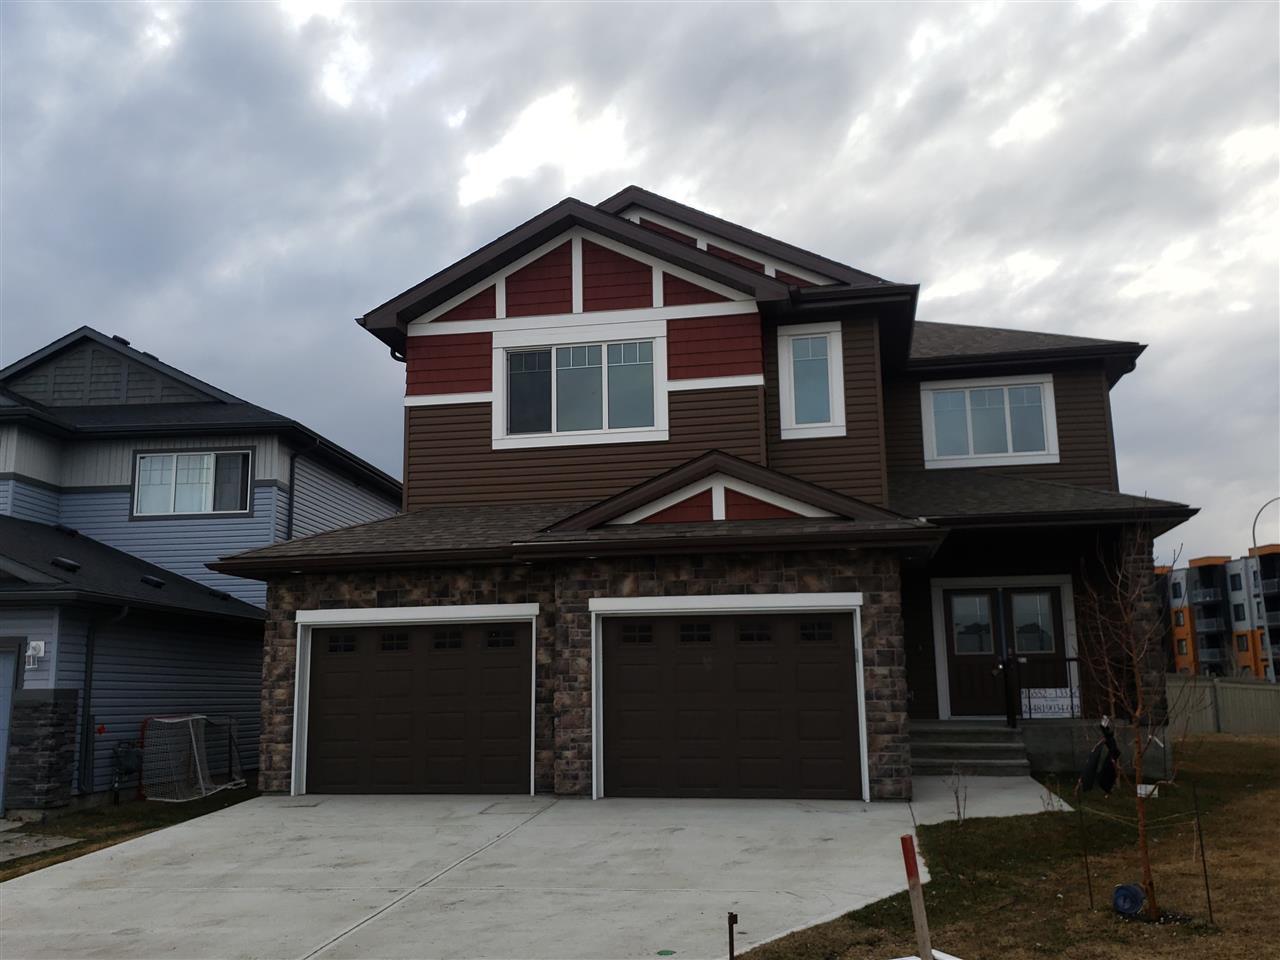 Main Photo: 16552 133 Street in Edmonton: Zone 27 House for sale : MLS®# E4151653